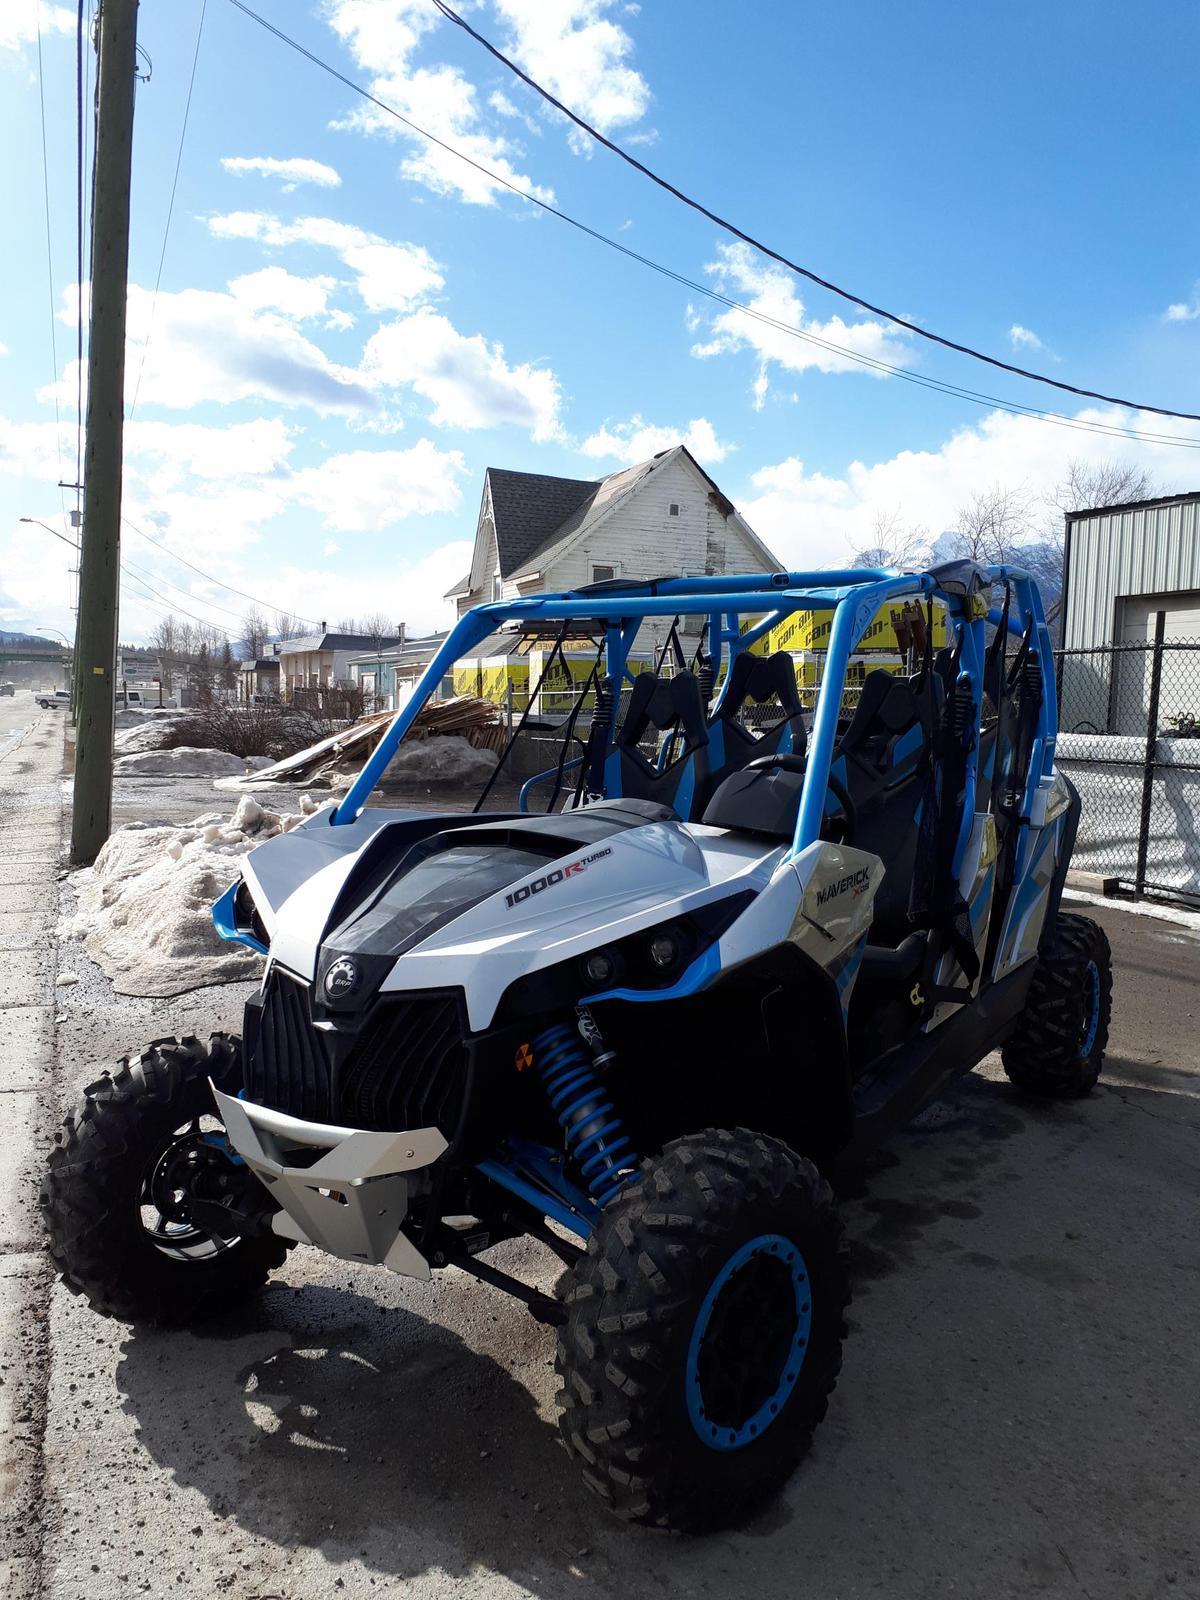 2017 Can-Am ATV Maverick™ Max X® Ds Turbo